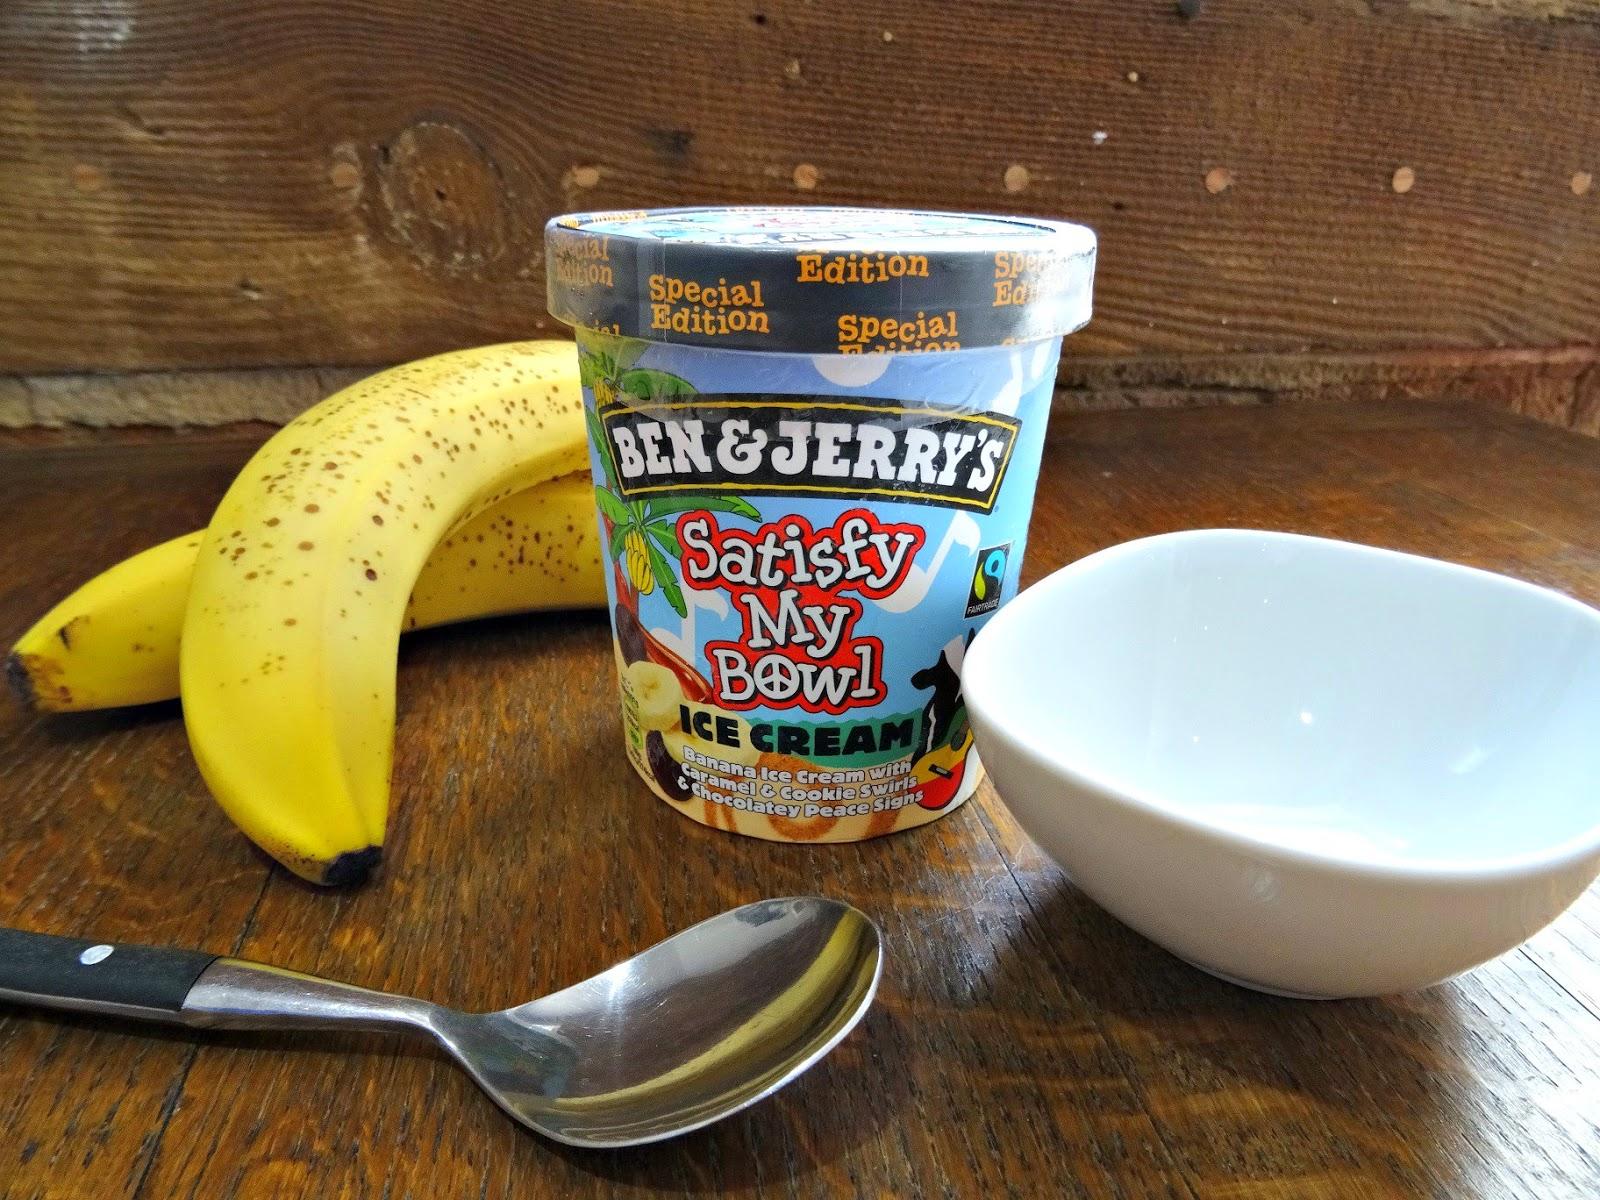 Satisfy my Bowl Ben and Jerry's Ice Cream